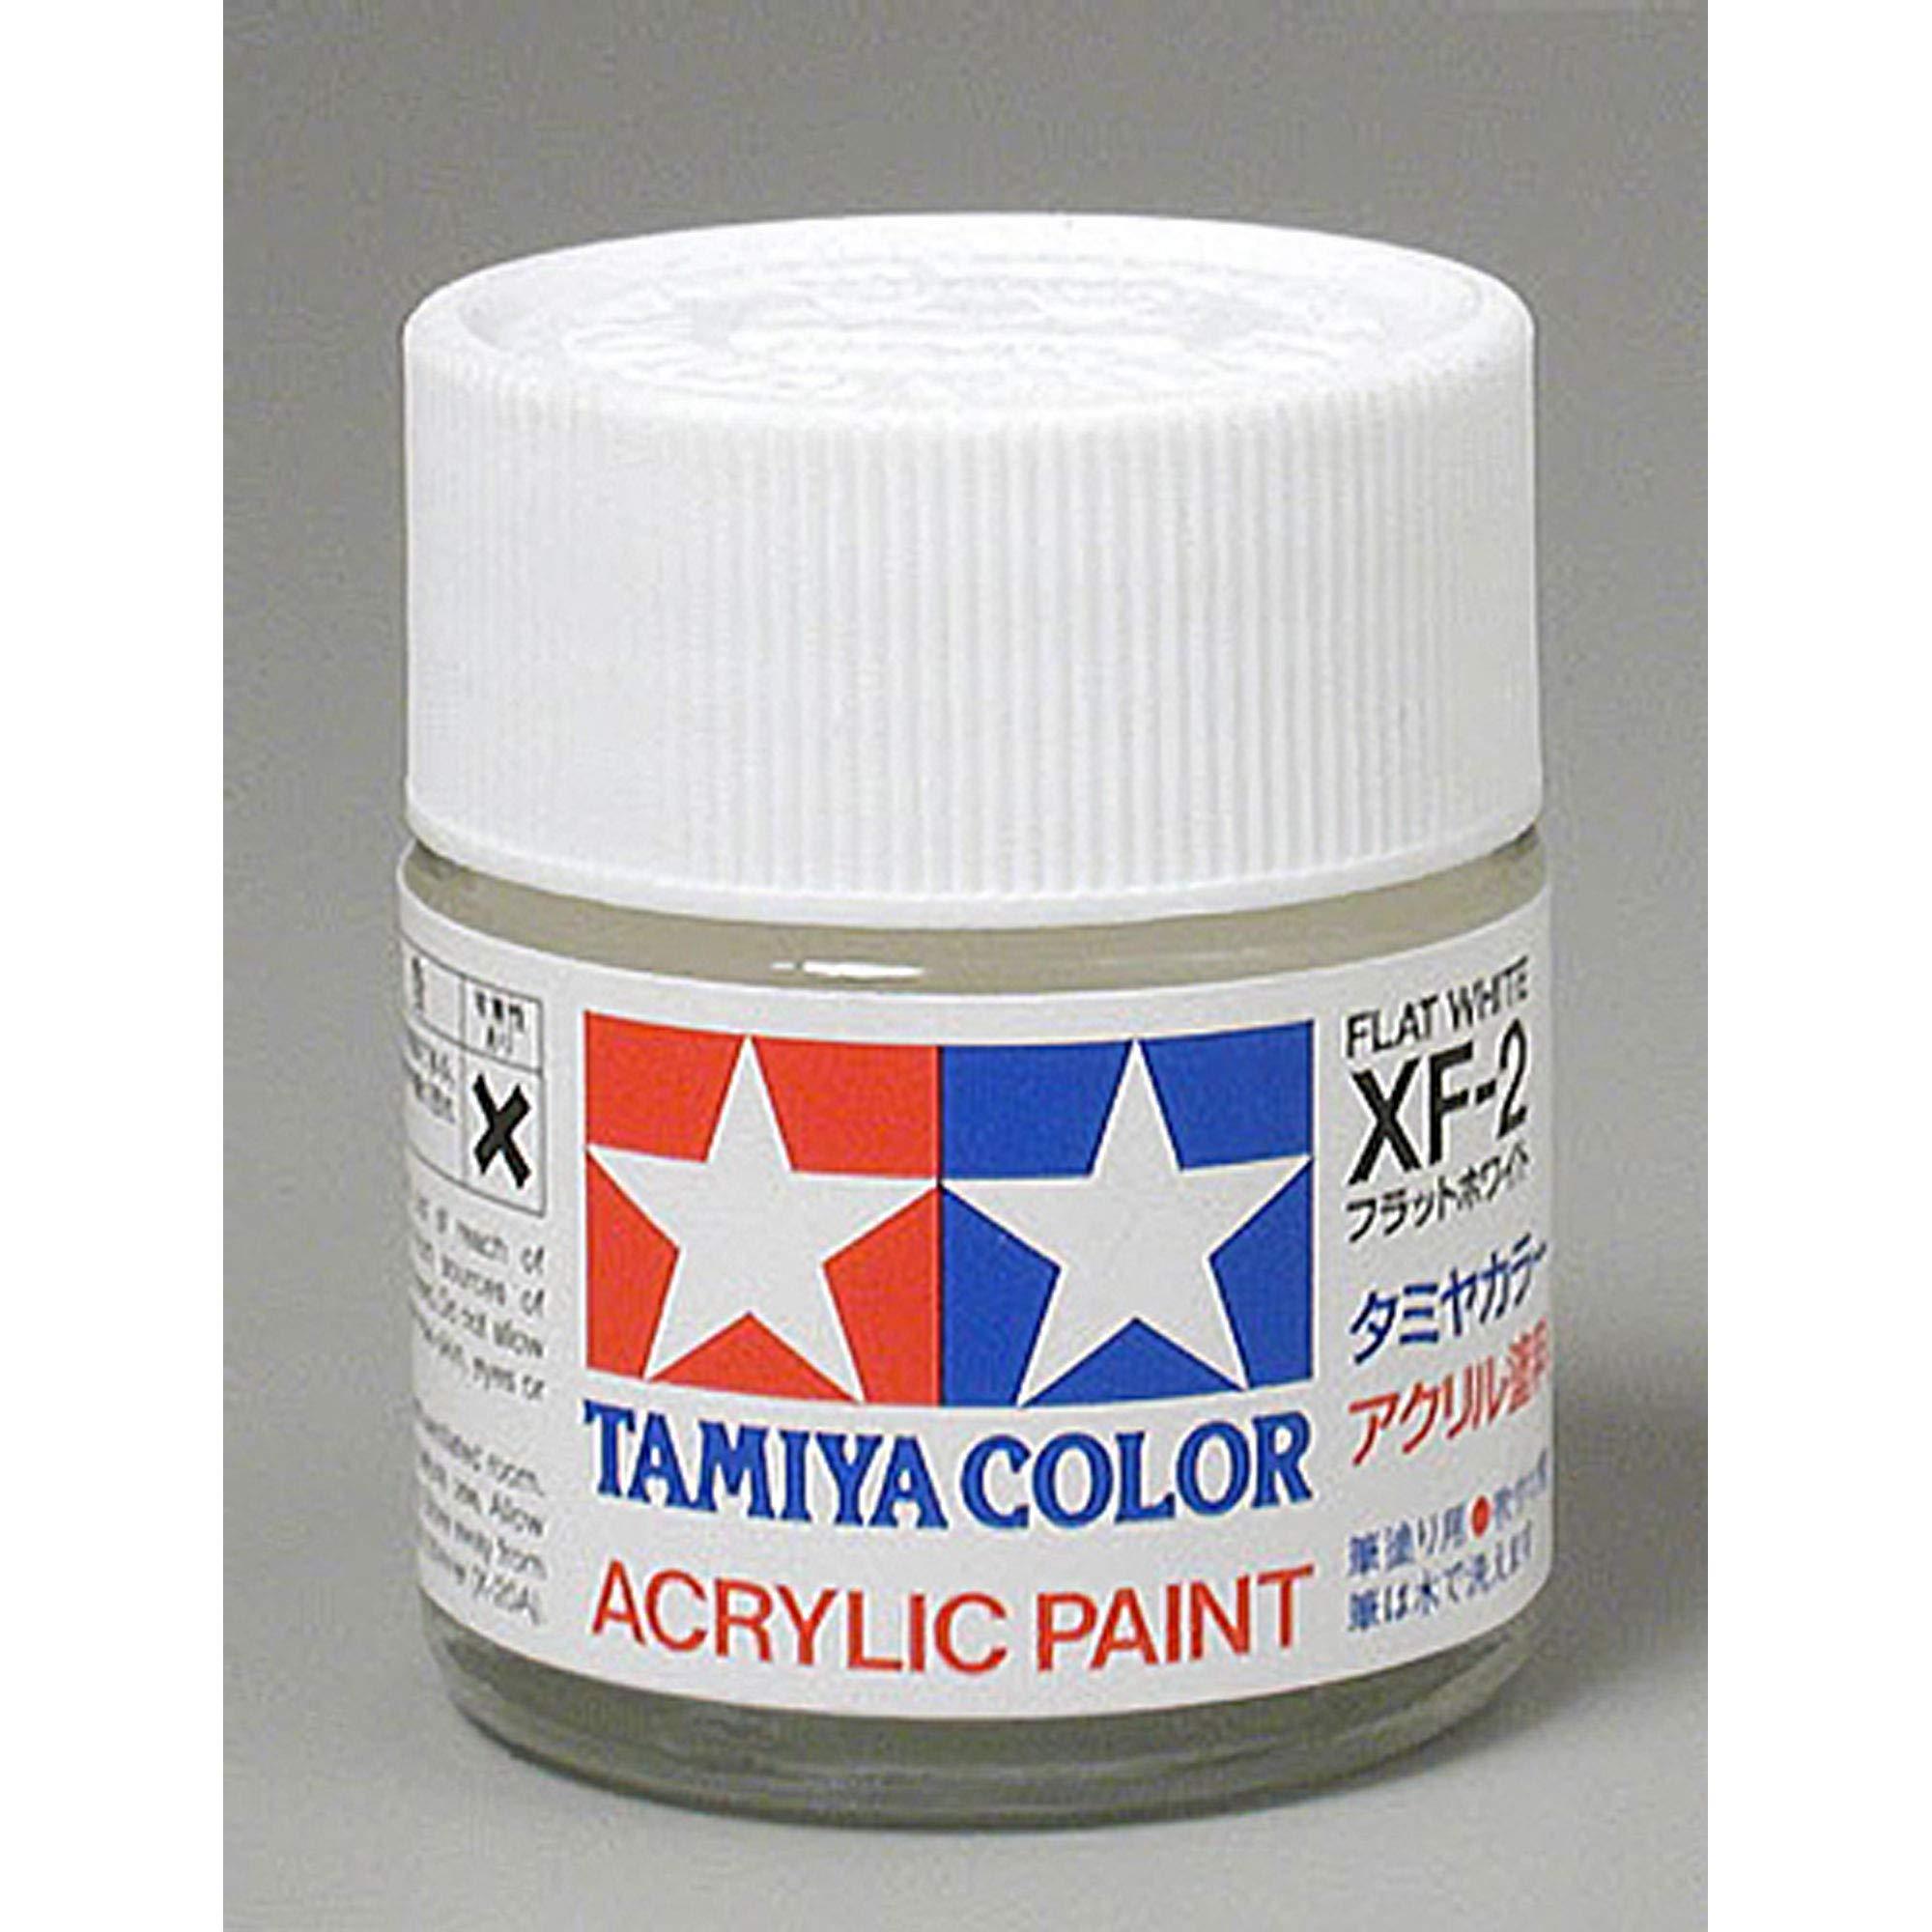 Tamiya TAM81302 Acrylic XF2 Flat, White 23ml.